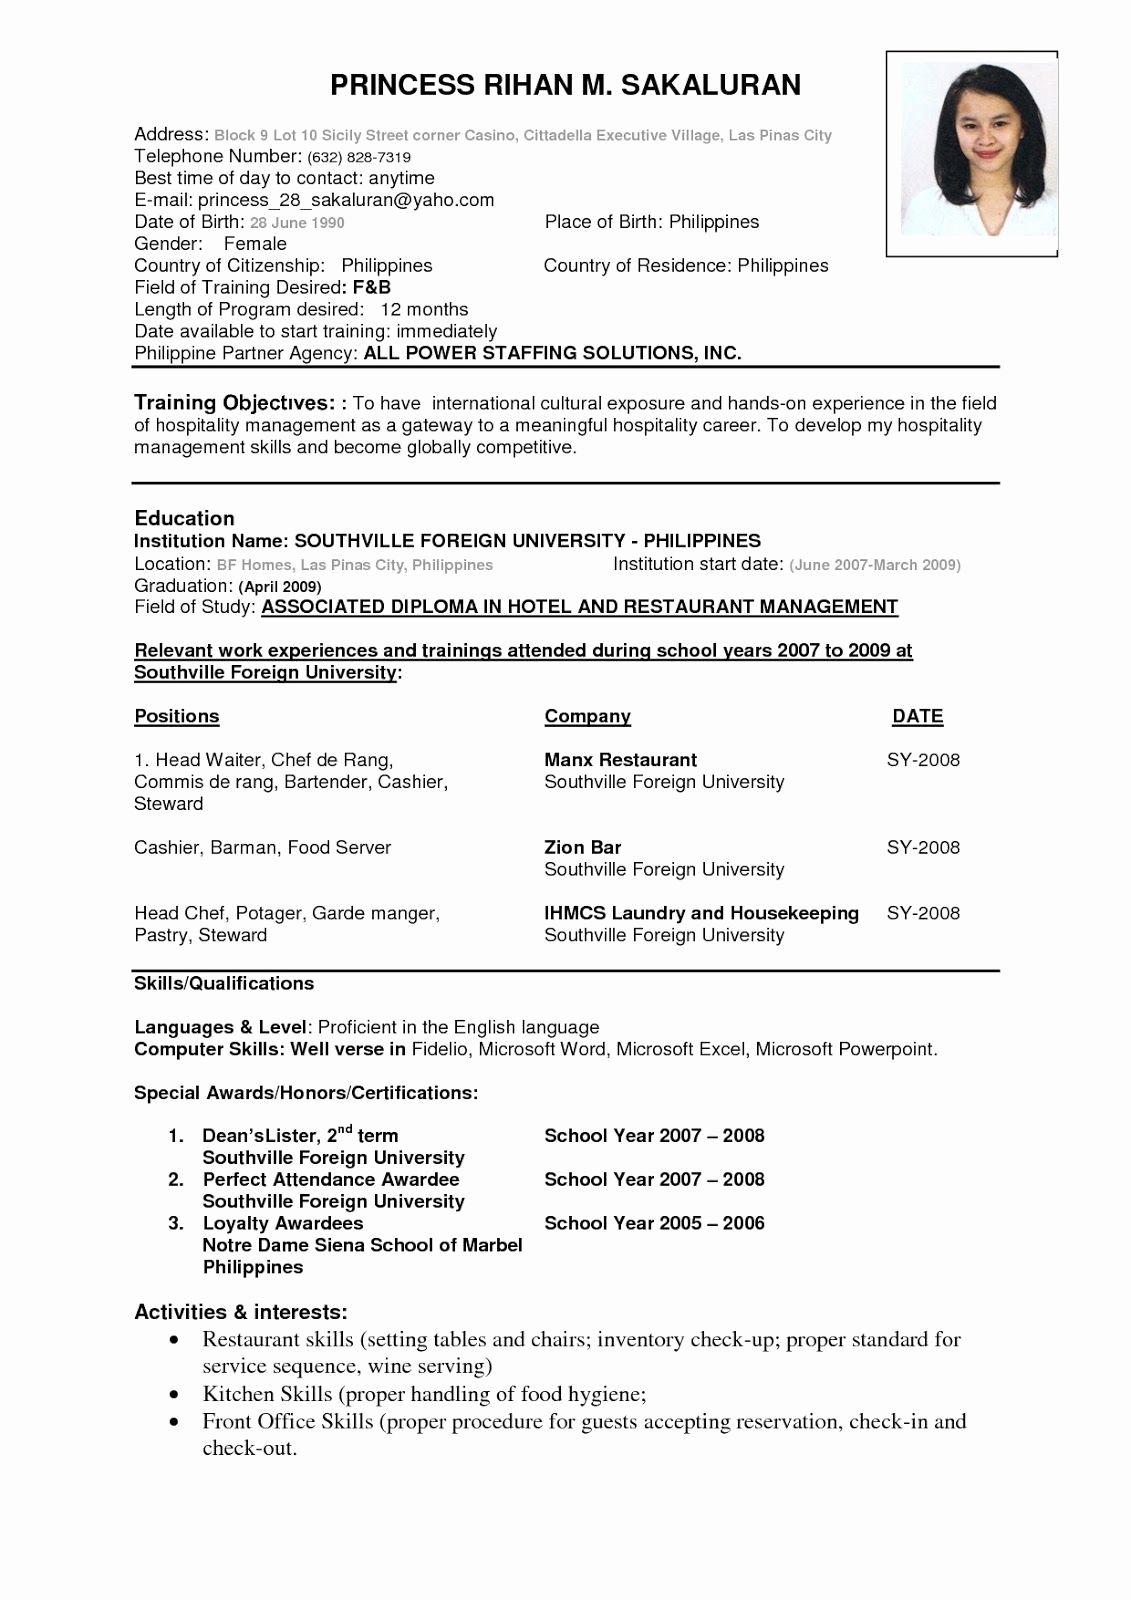 30 Free Resume Templates Pdf Resume Format Examples Job Resume